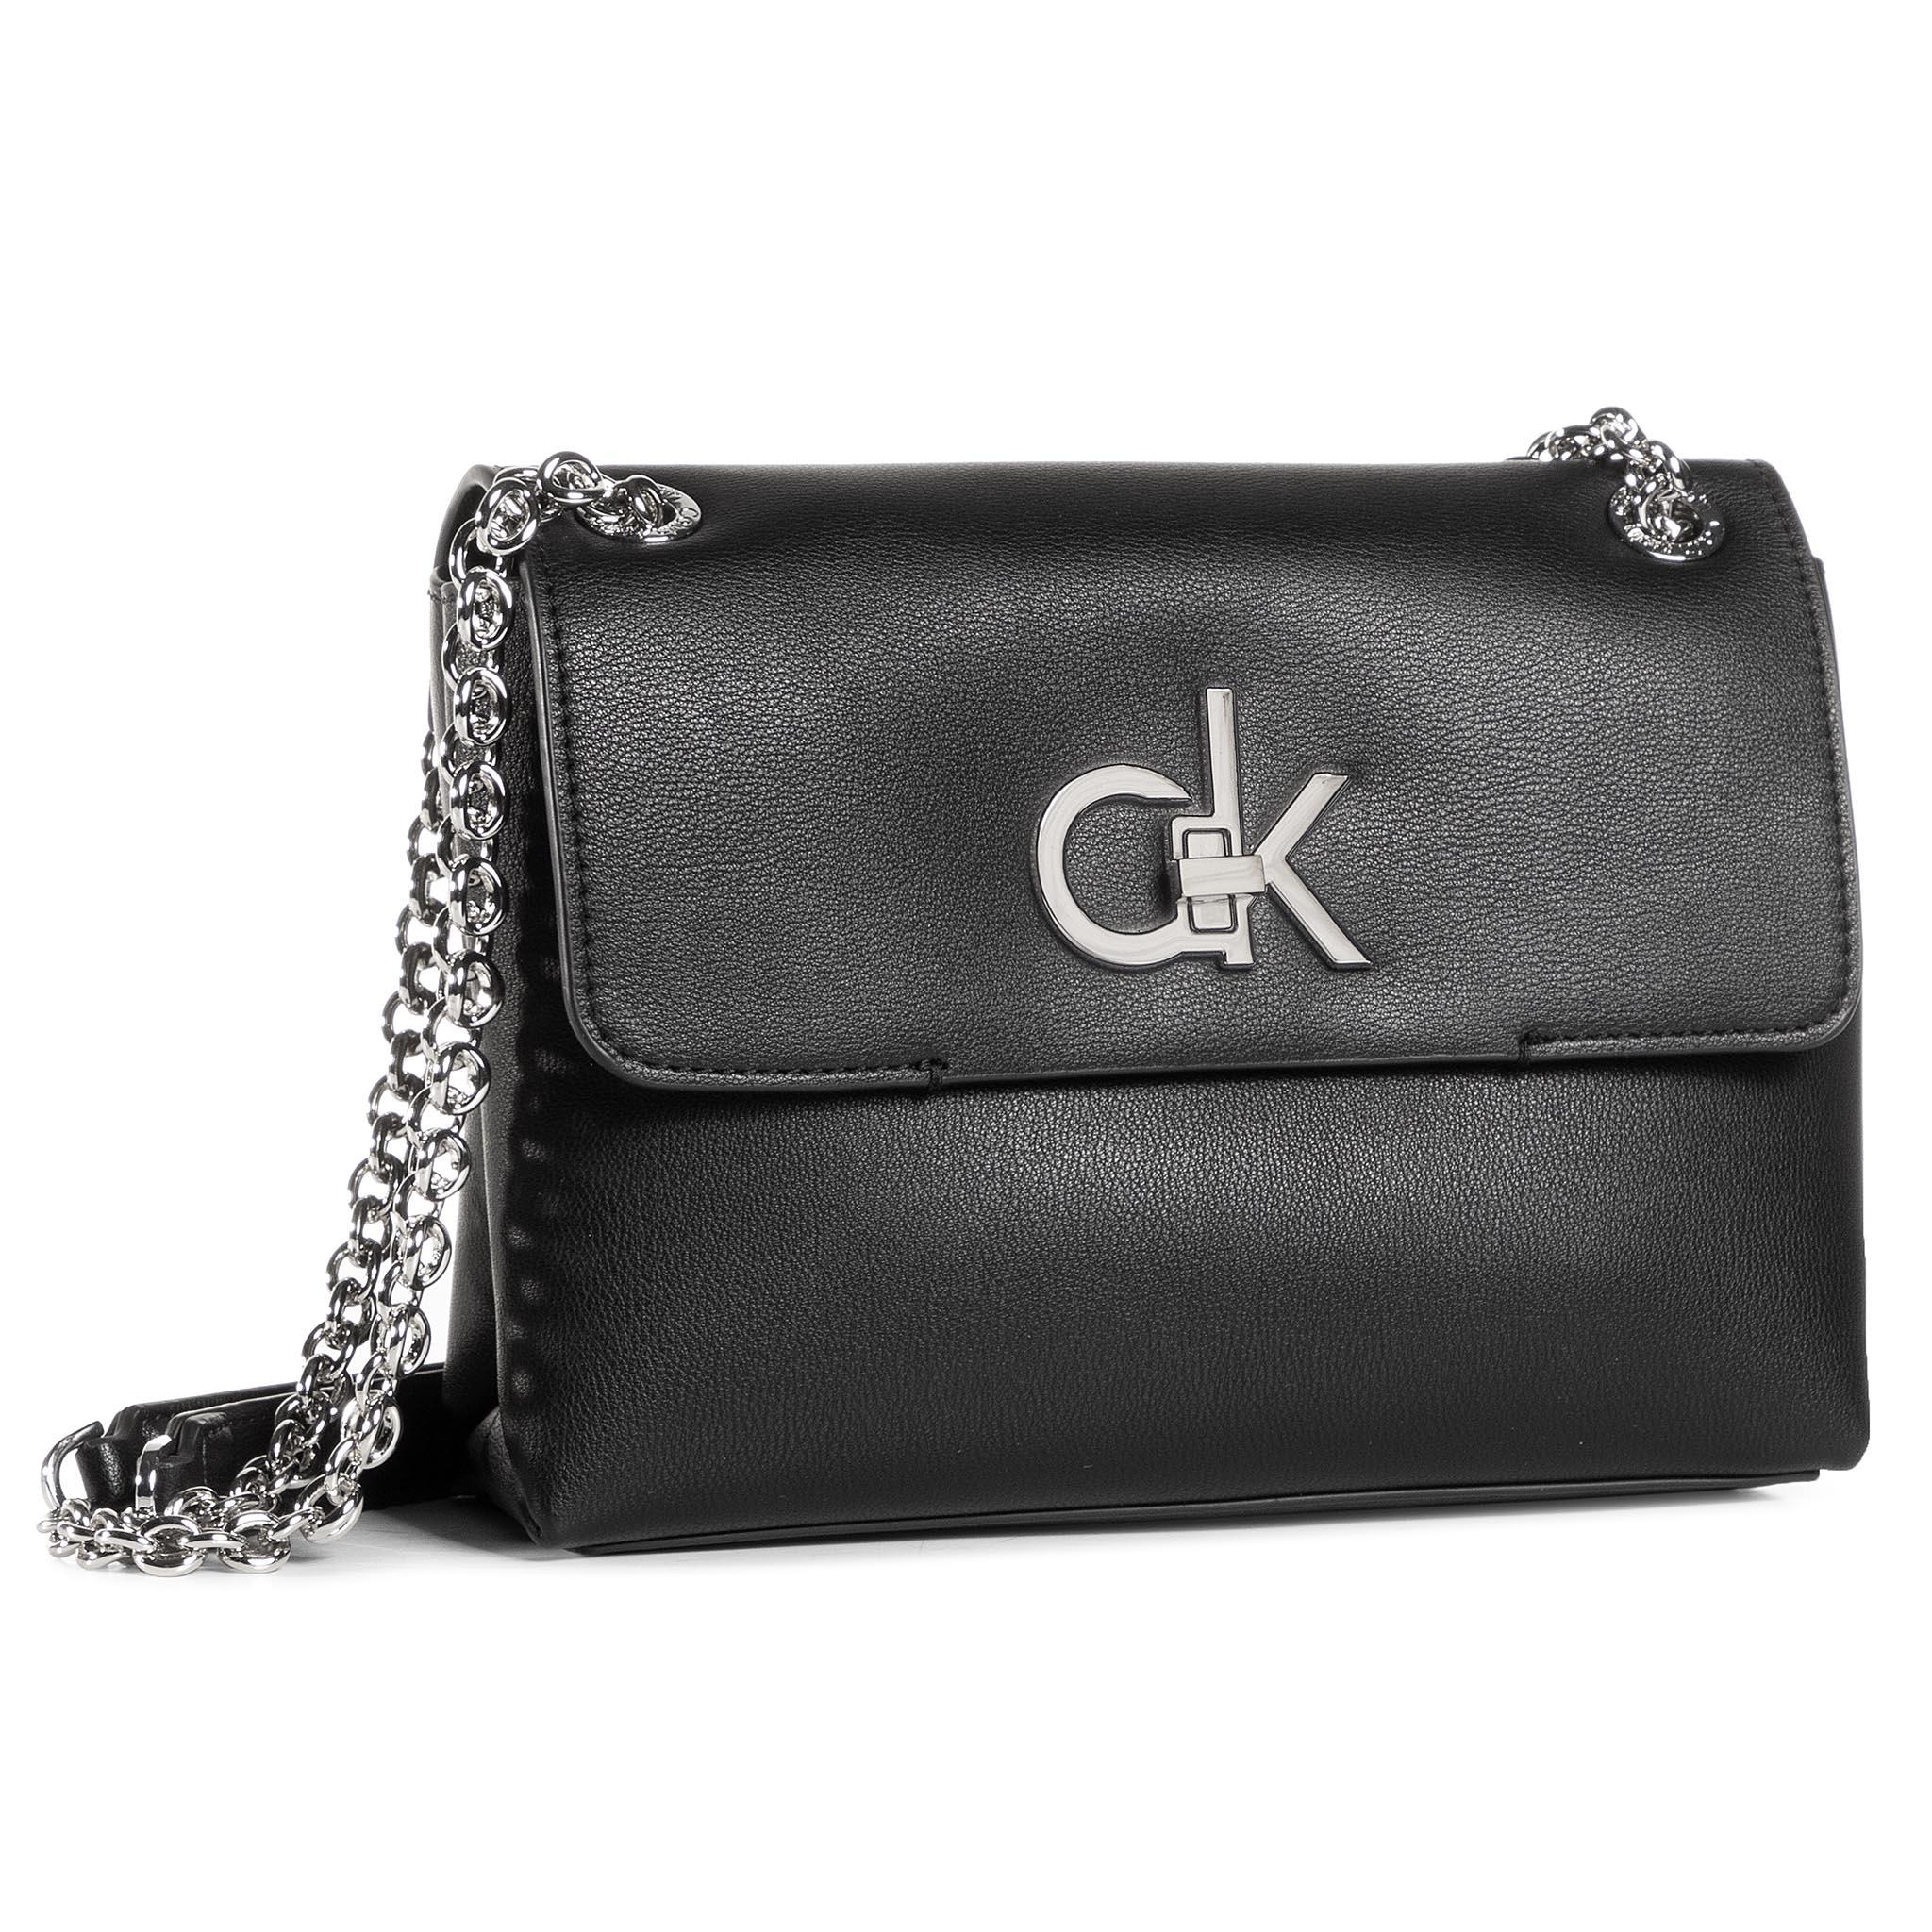 Image of Handtasche CALVIN KLEIN - Ew Conv Flap Crossbody Md K60K606675 BAX